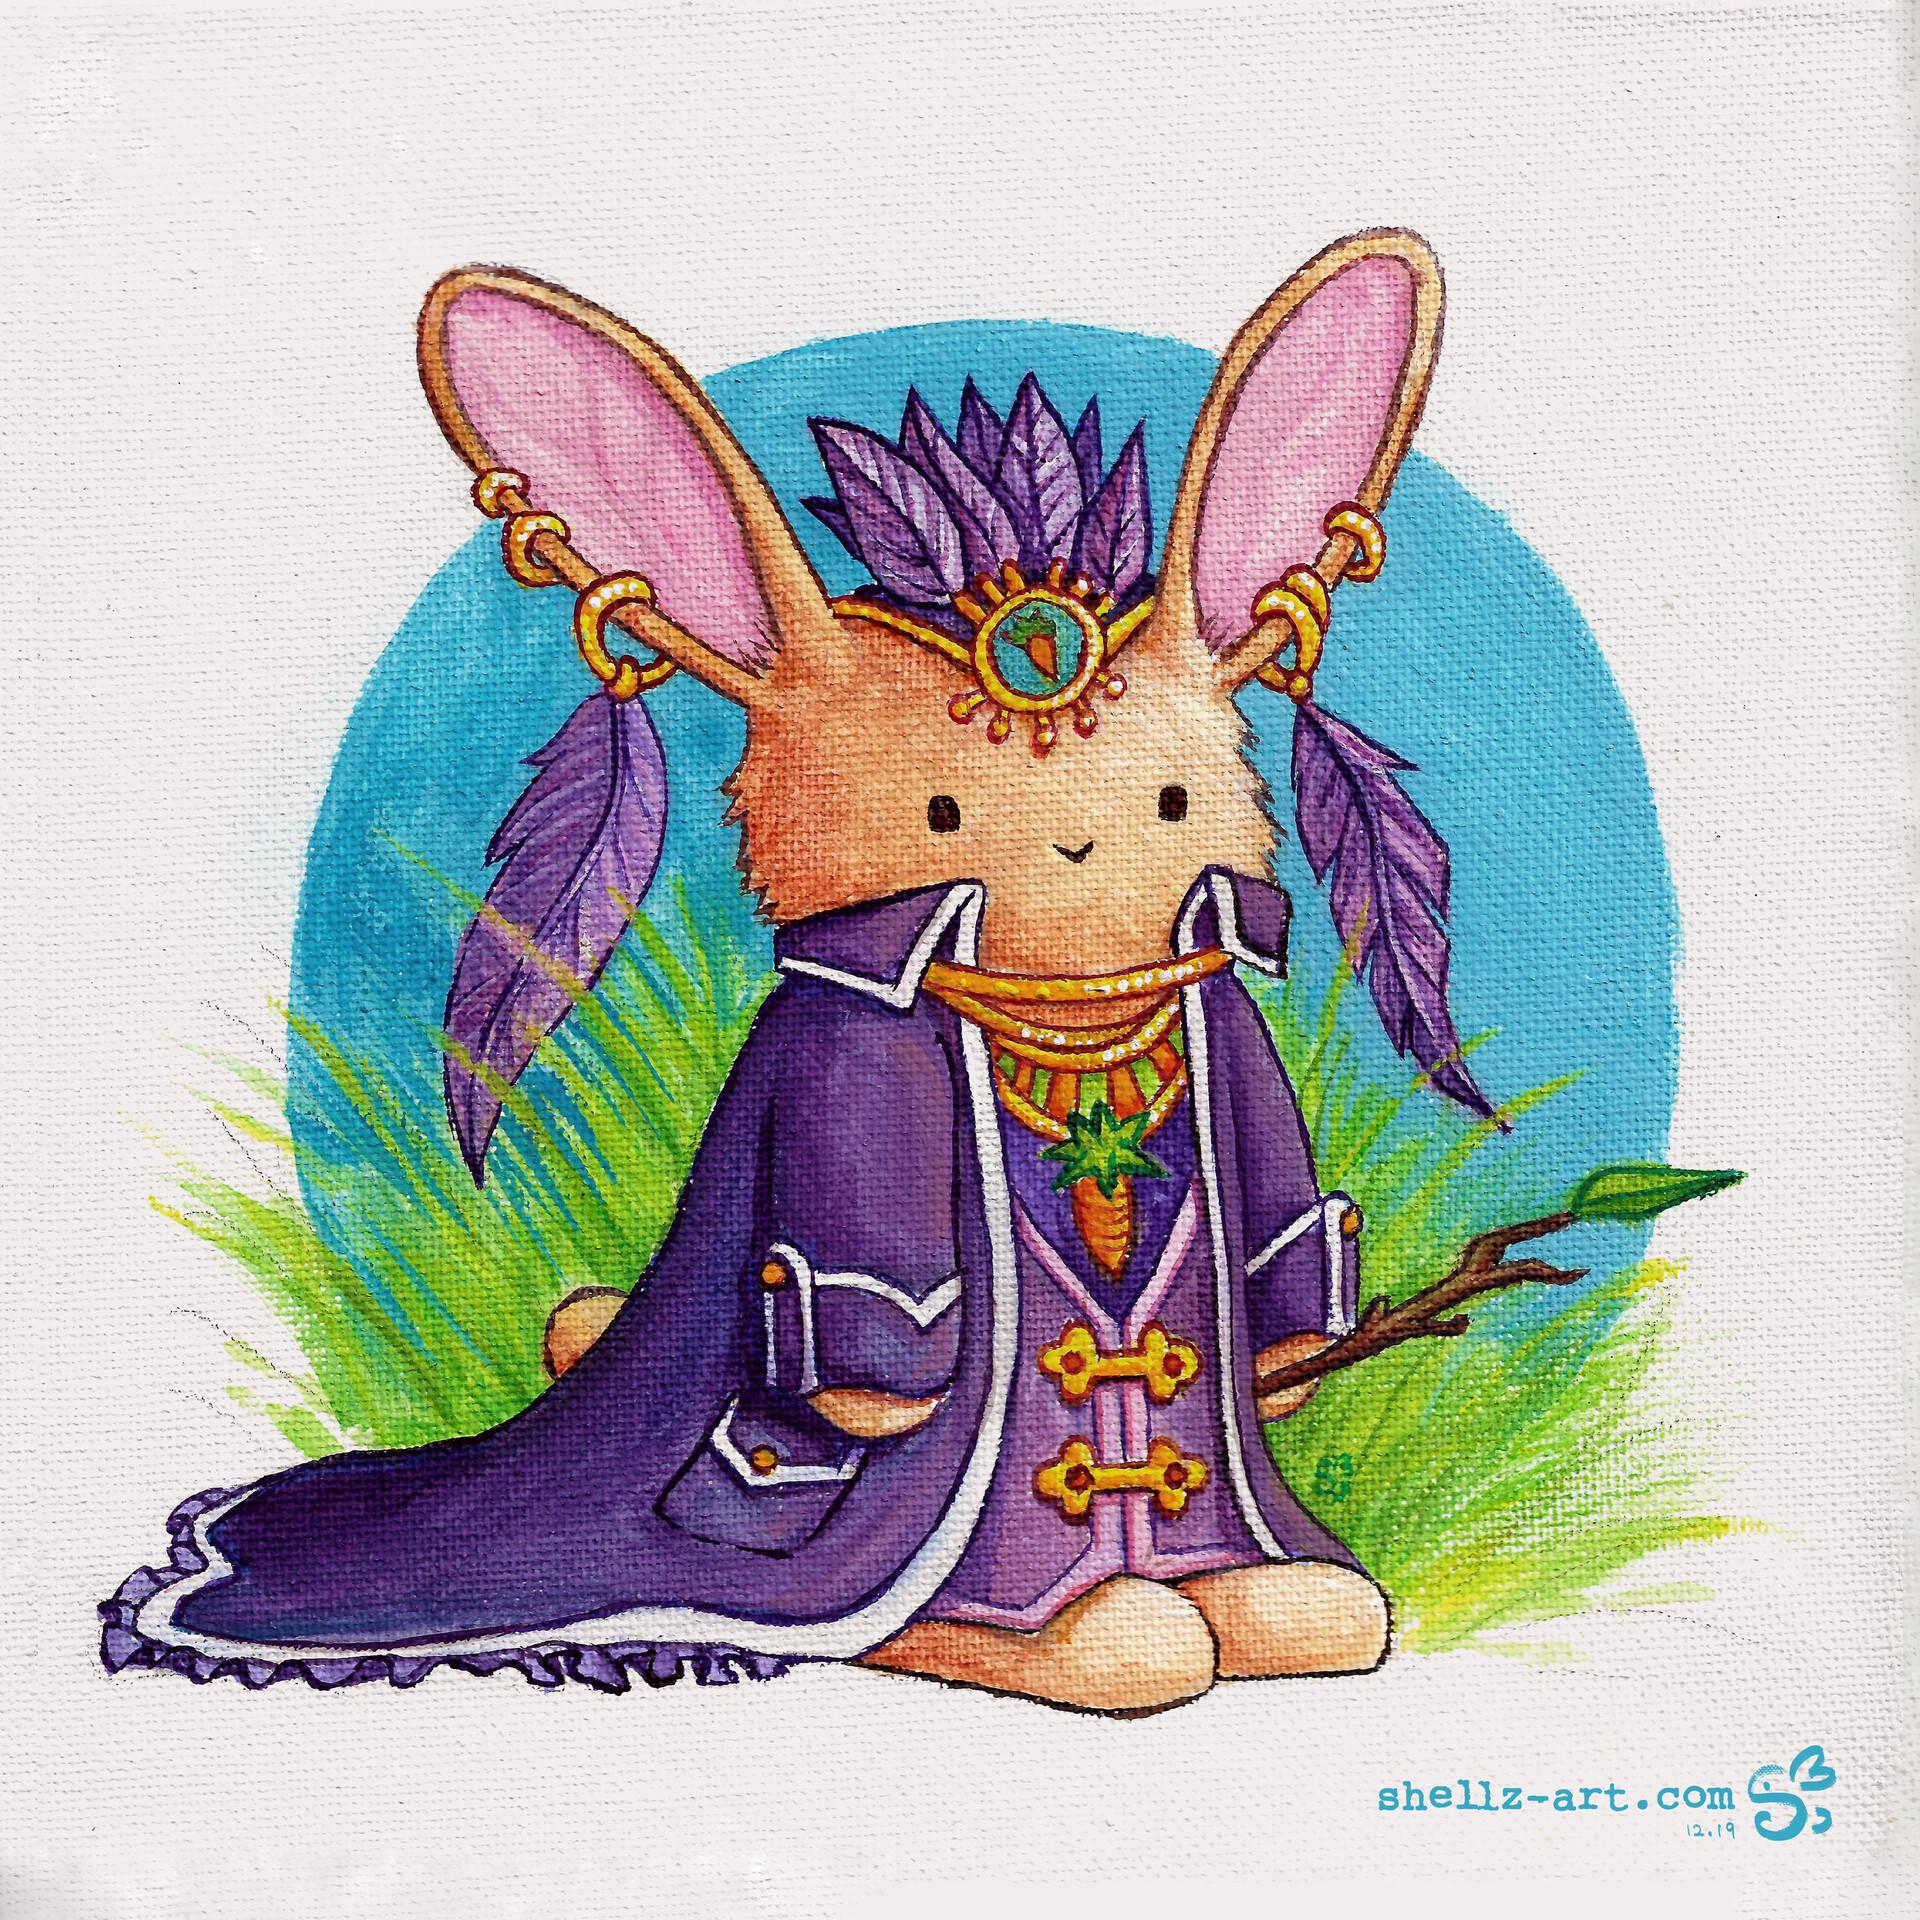 Shellz art the bunny of the ombawaybop tree s